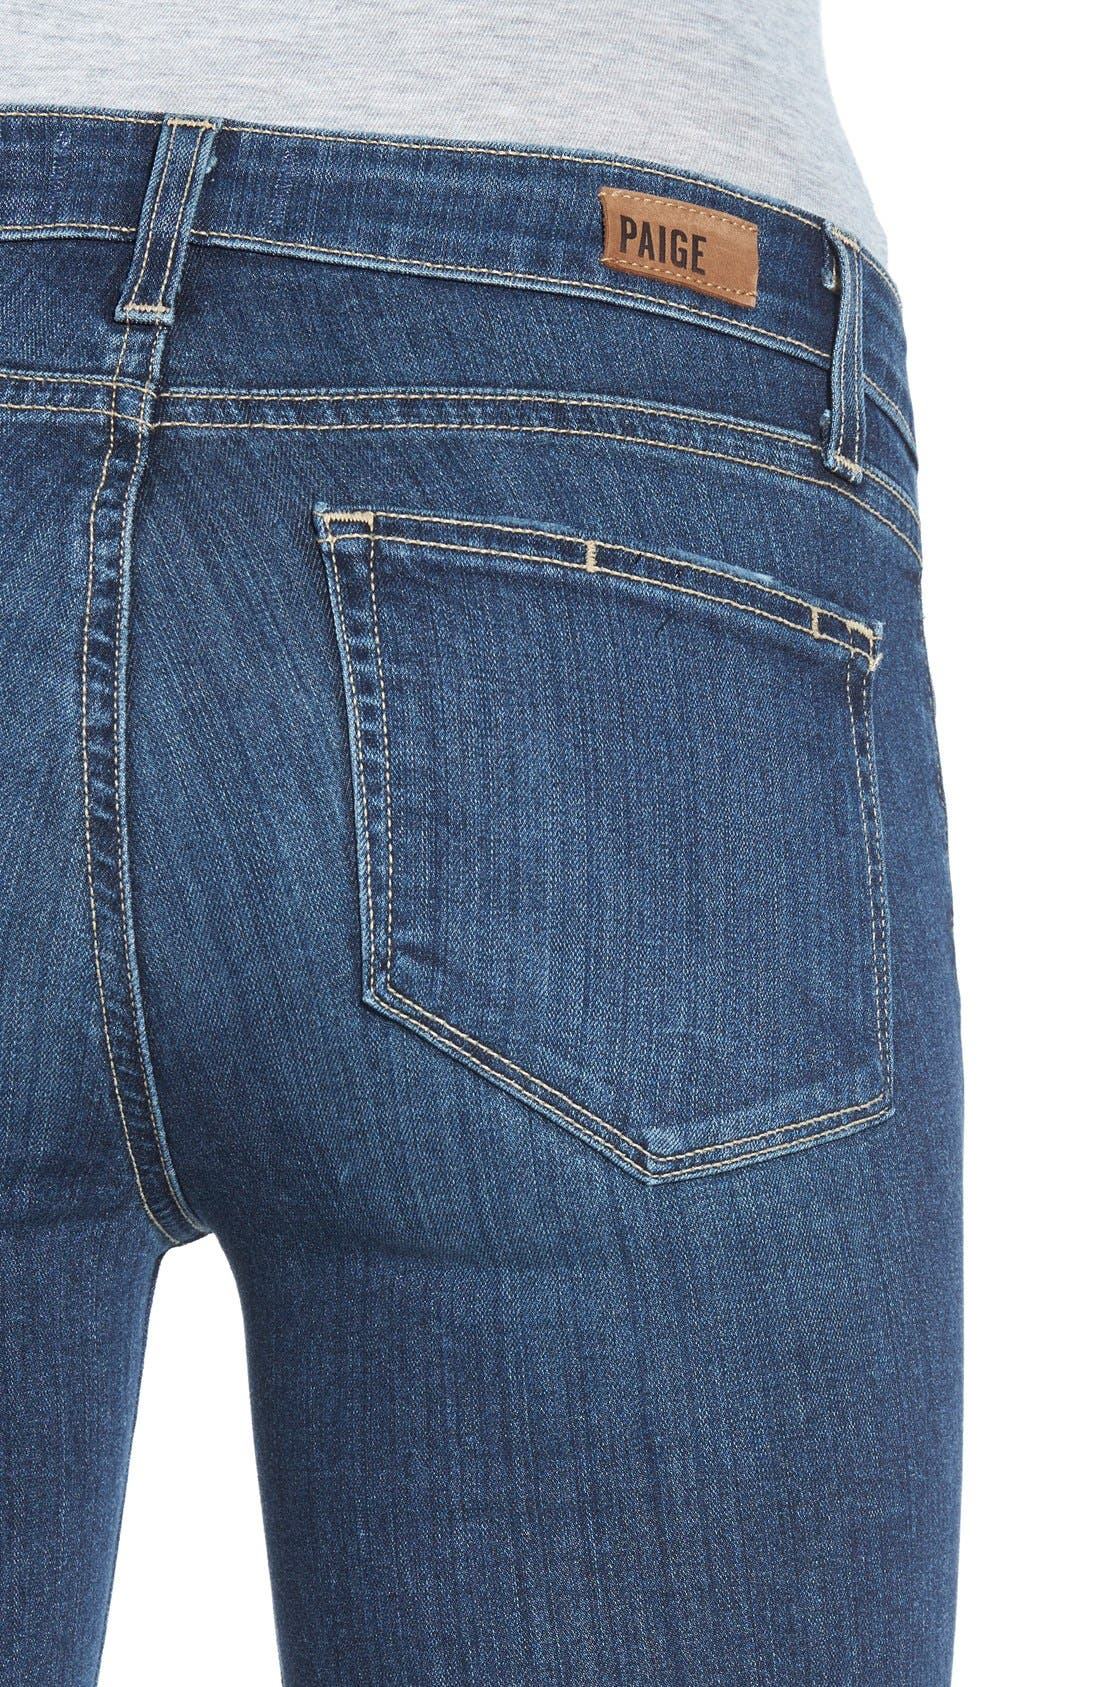 Alternate Image 4  - Paige Denim 'Transcend - Verdugo' Ultra Skinny Jeans (Elia Destructed)